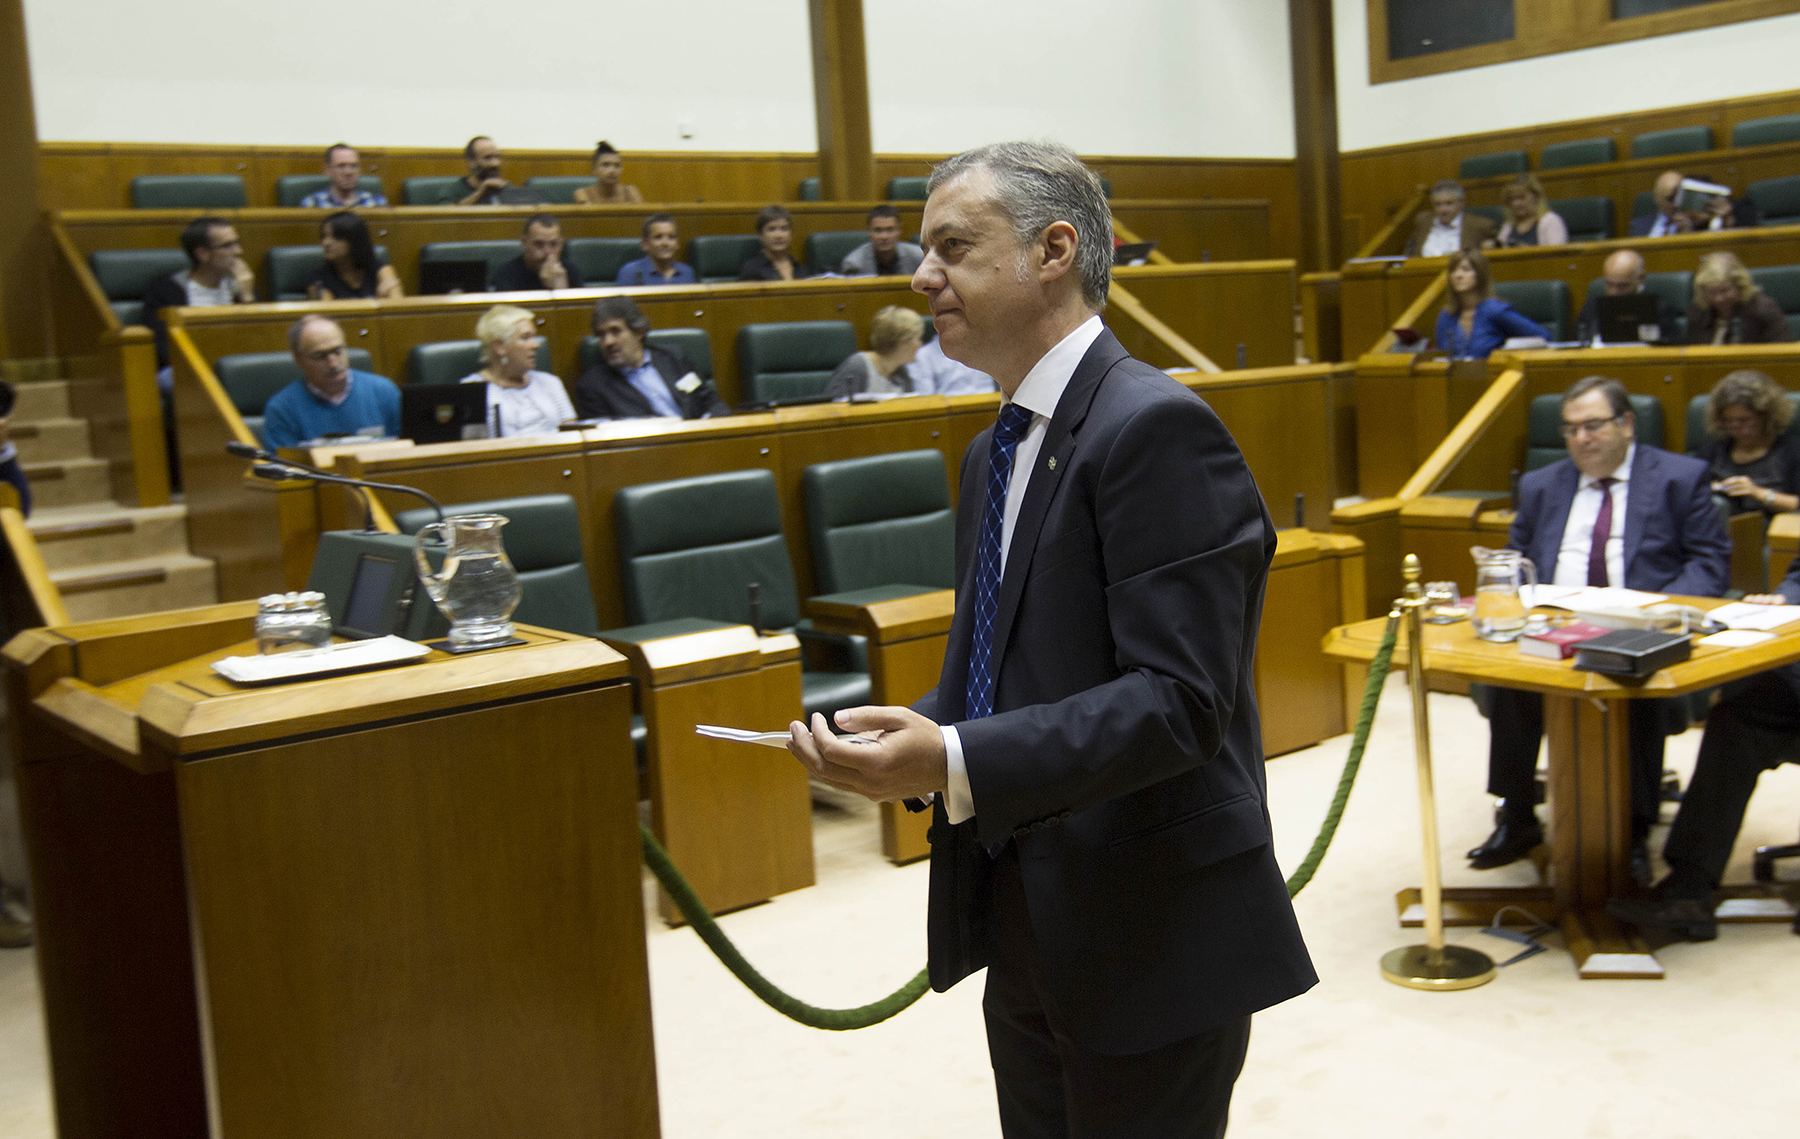 2015_09_24_lhk_parlamento_008.jpg